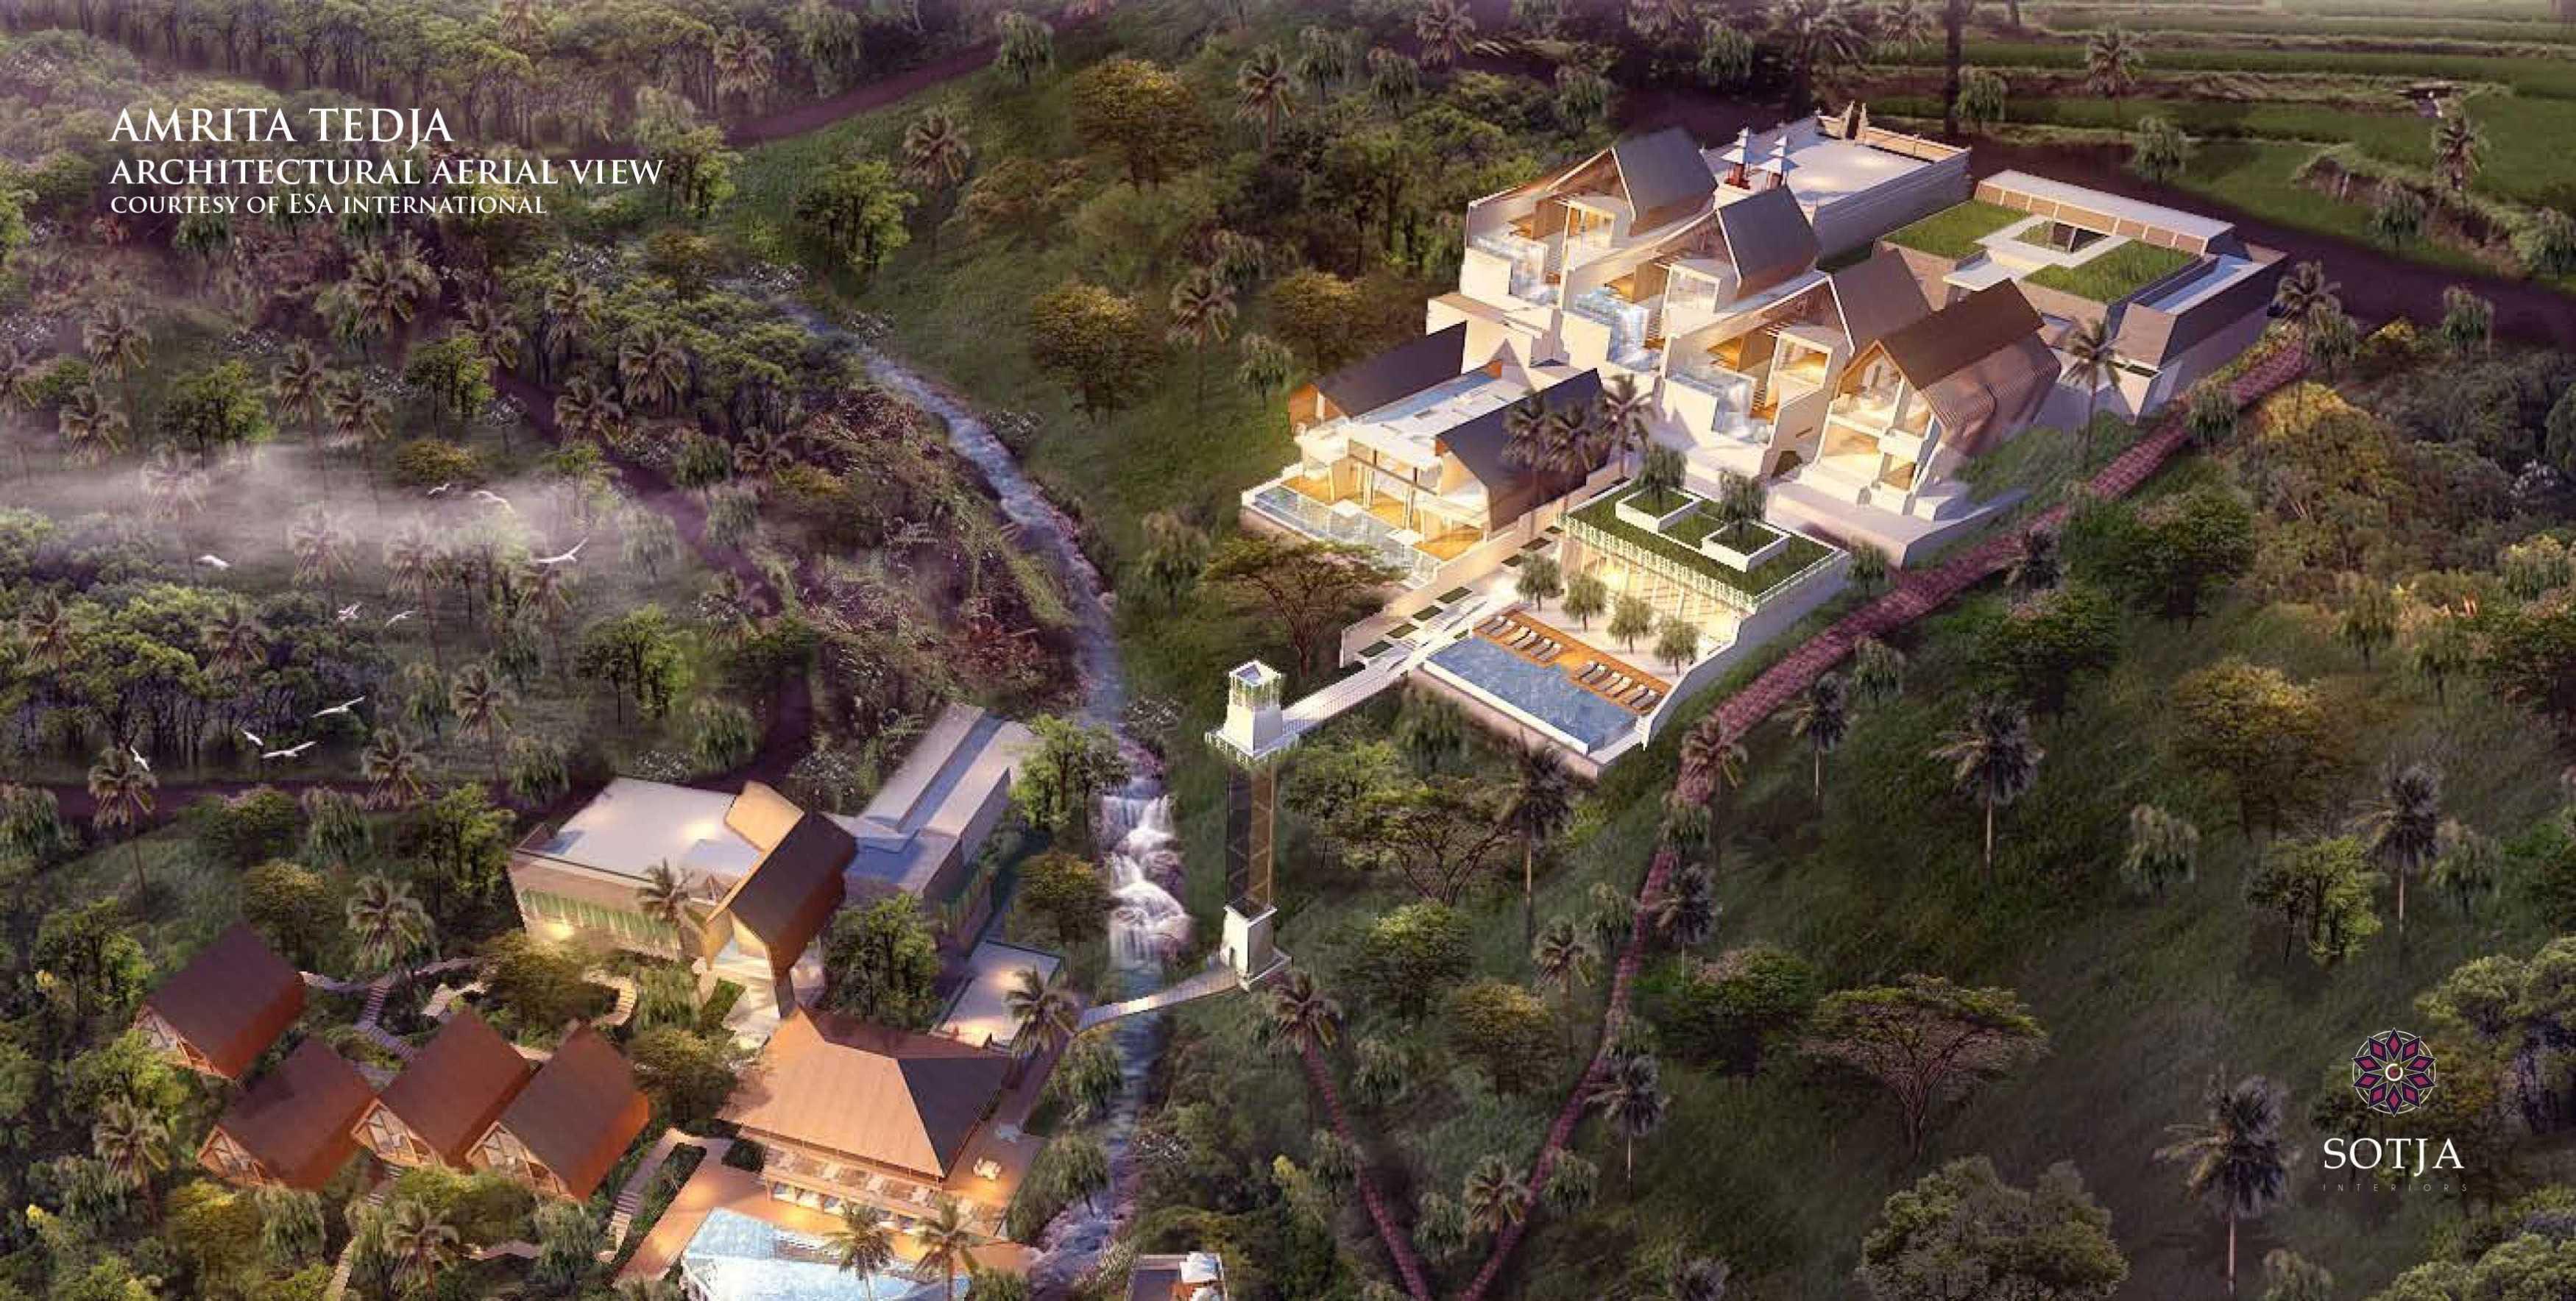 Sotja Interiors Amrita Tedja At Ubud Bali, Indonesia Bali, Indonesia Architectural Aerial View Tropical  8714